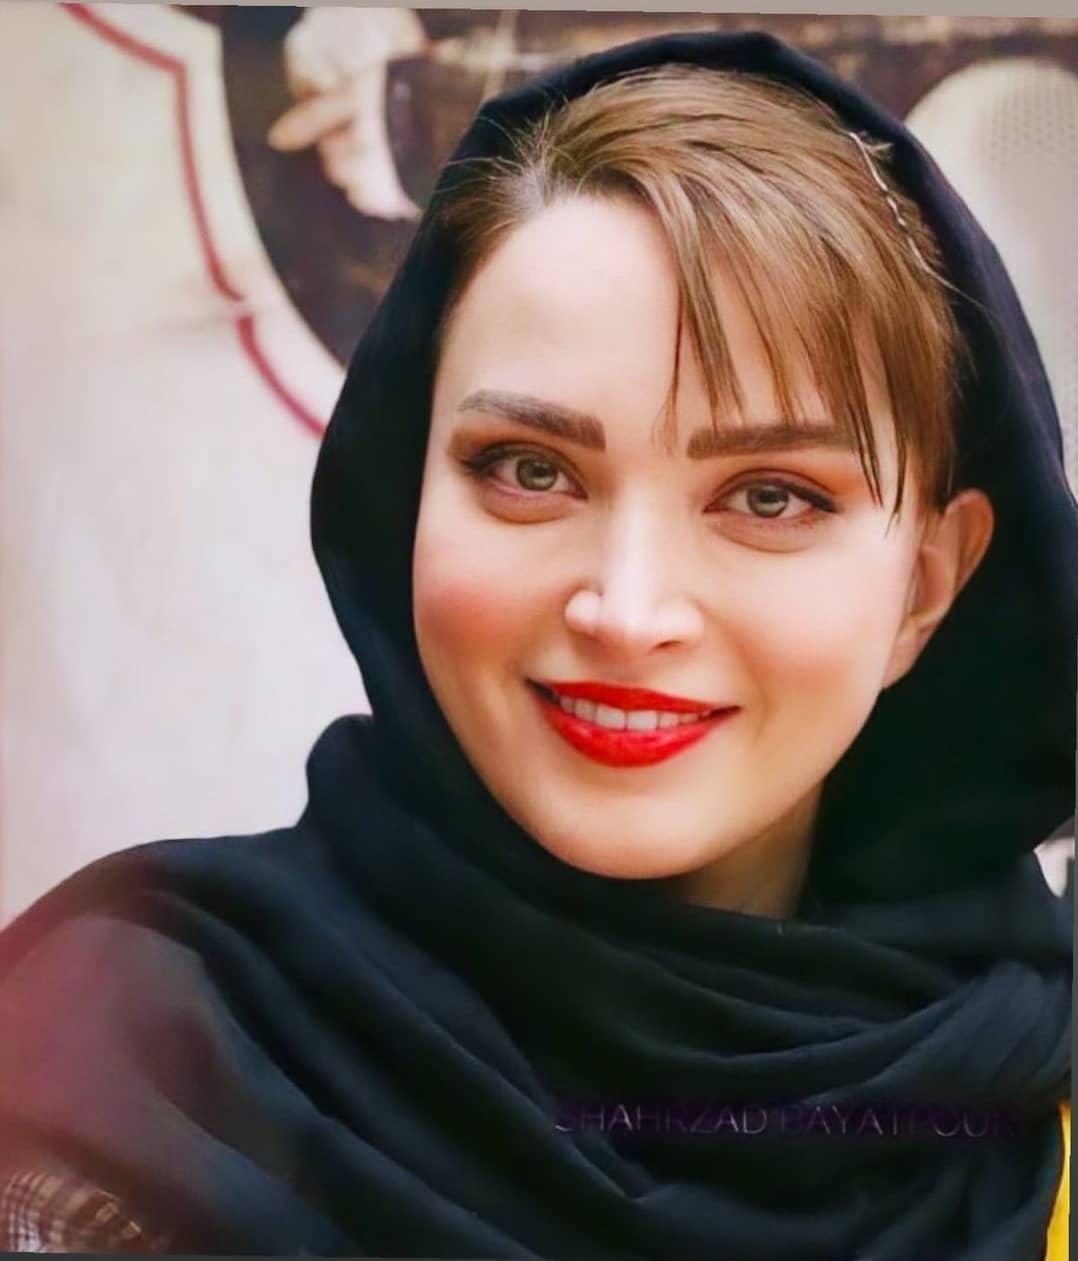 behnoushtabatabai vaghtesobh 1 - عکس/ تغییر چهره محسوس بهنوش طباطبایی